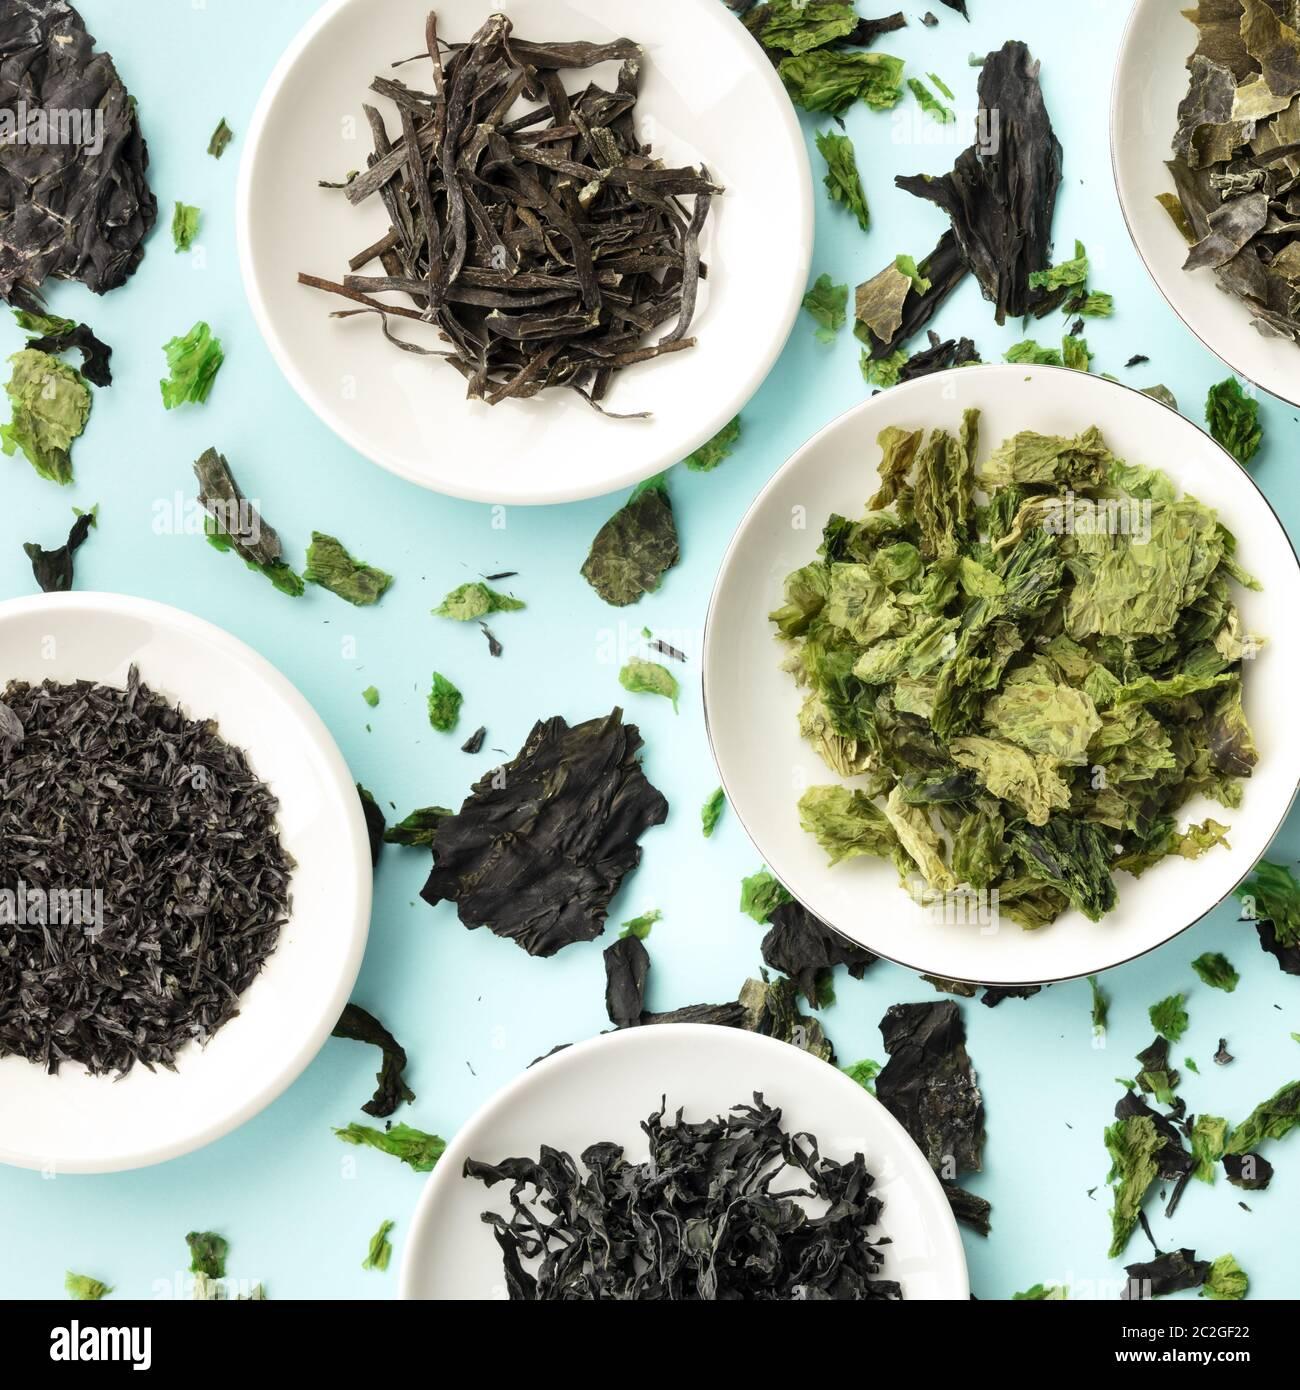 Diversas algas secas, verduras, plaza mar Fotografía cenital sobre un fondo verde azulado Foto de stock